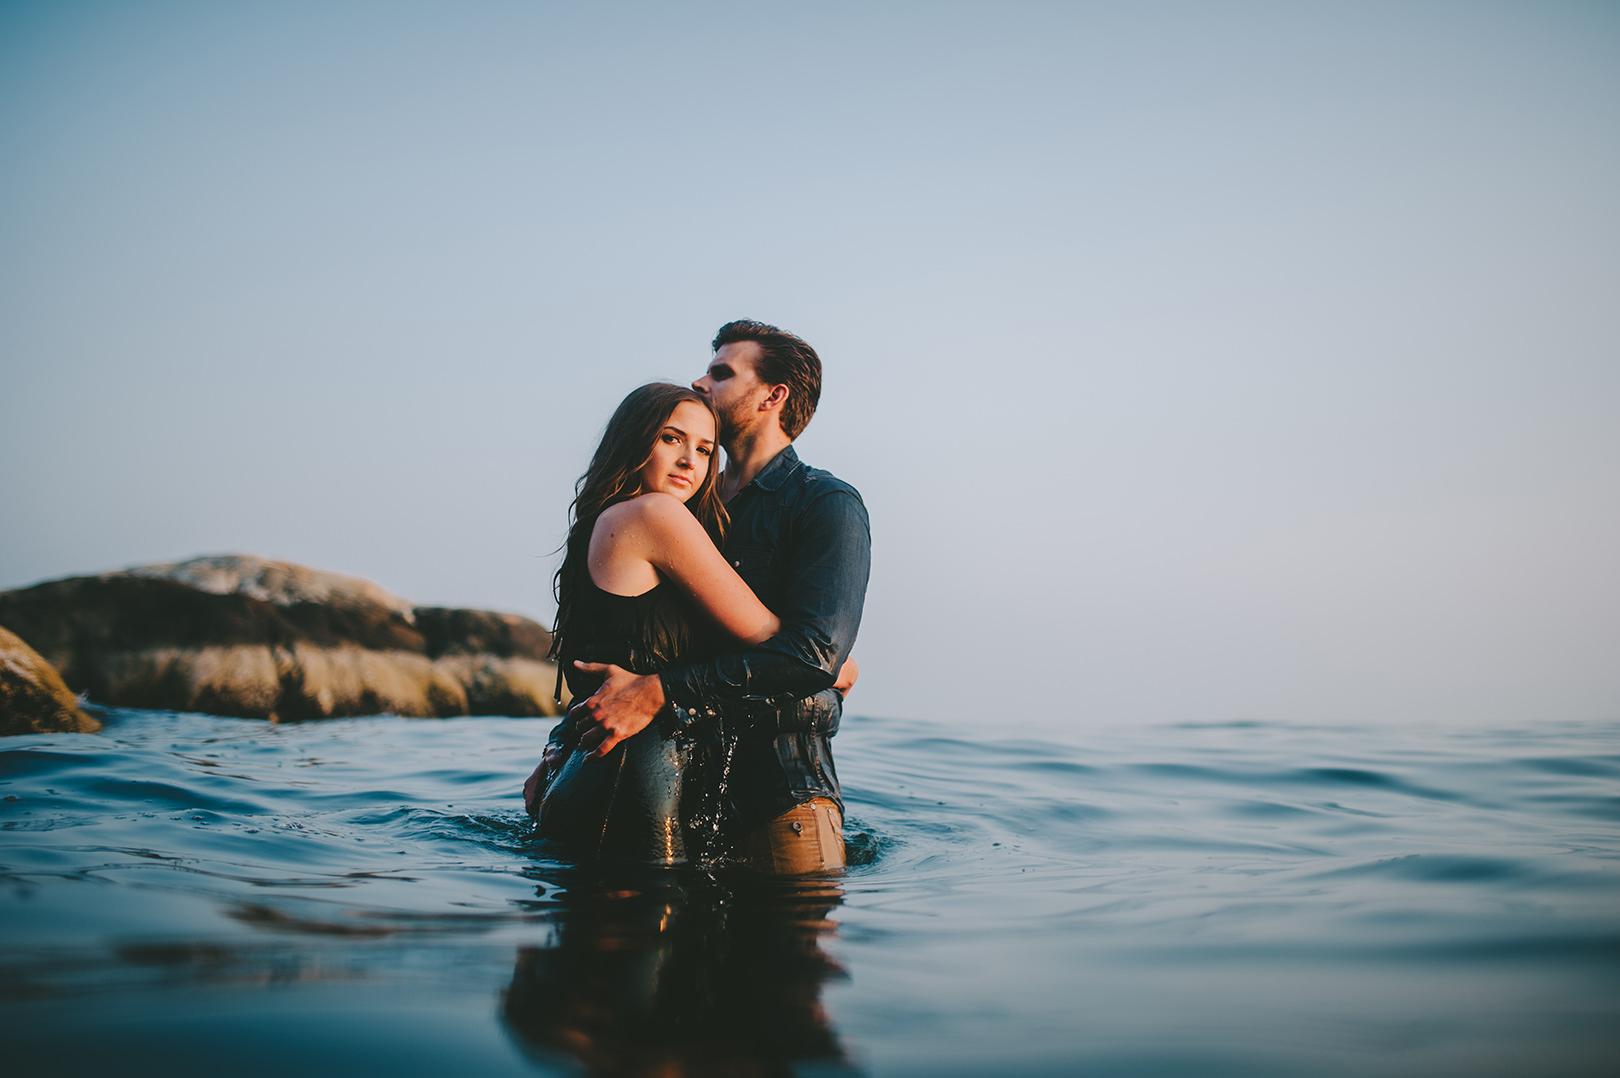 Spain Wedding Photographer - © Dallas Kolotylo Photography - 092